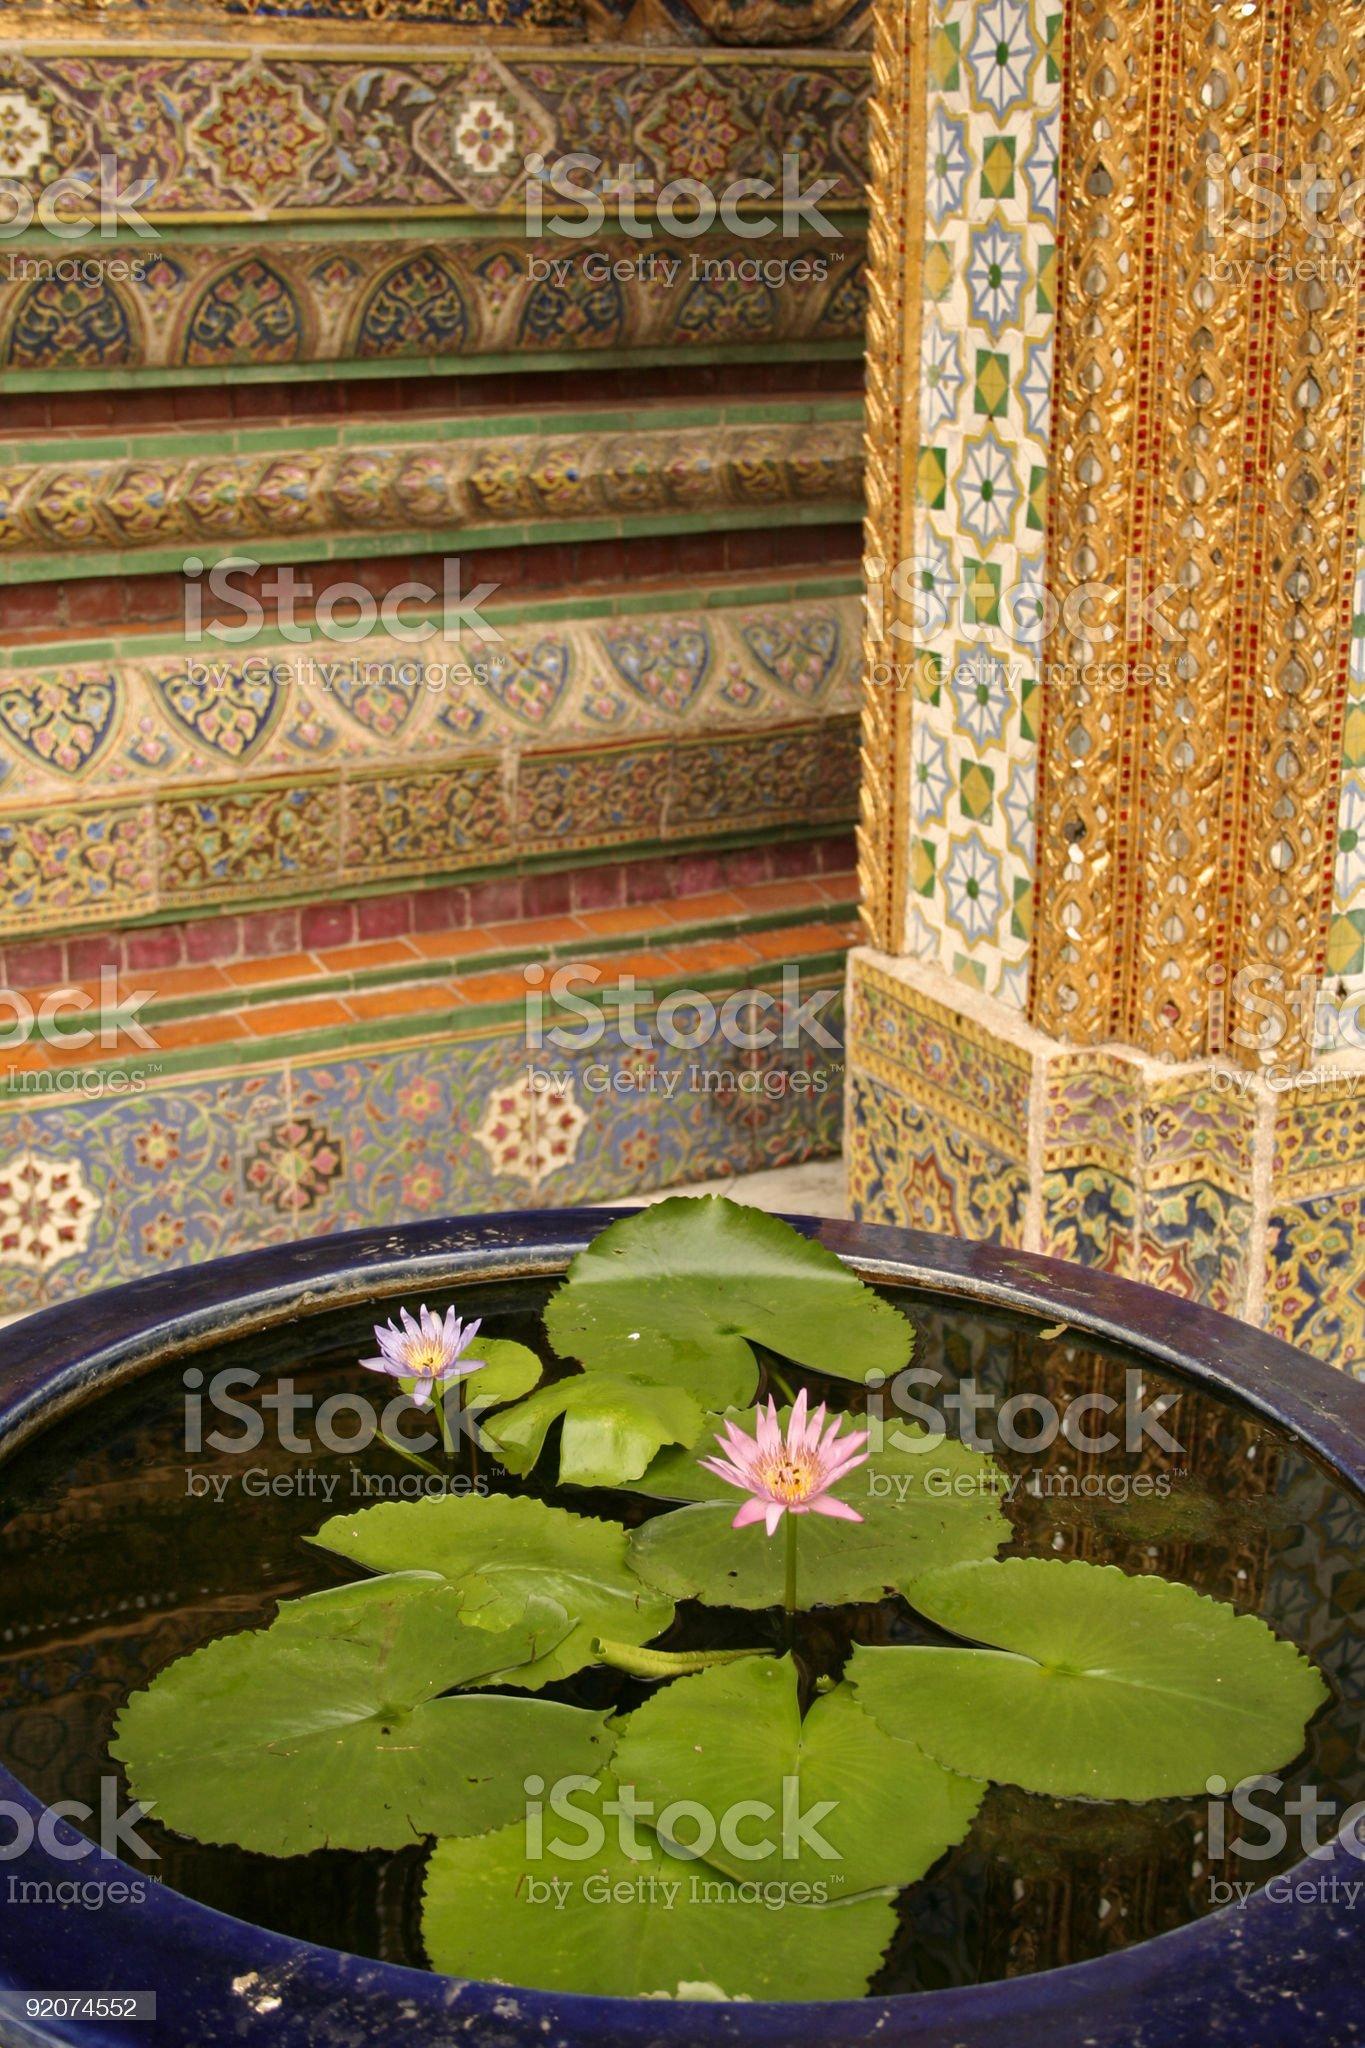 Water flowers grand palace bangkok royalty-free stock photo